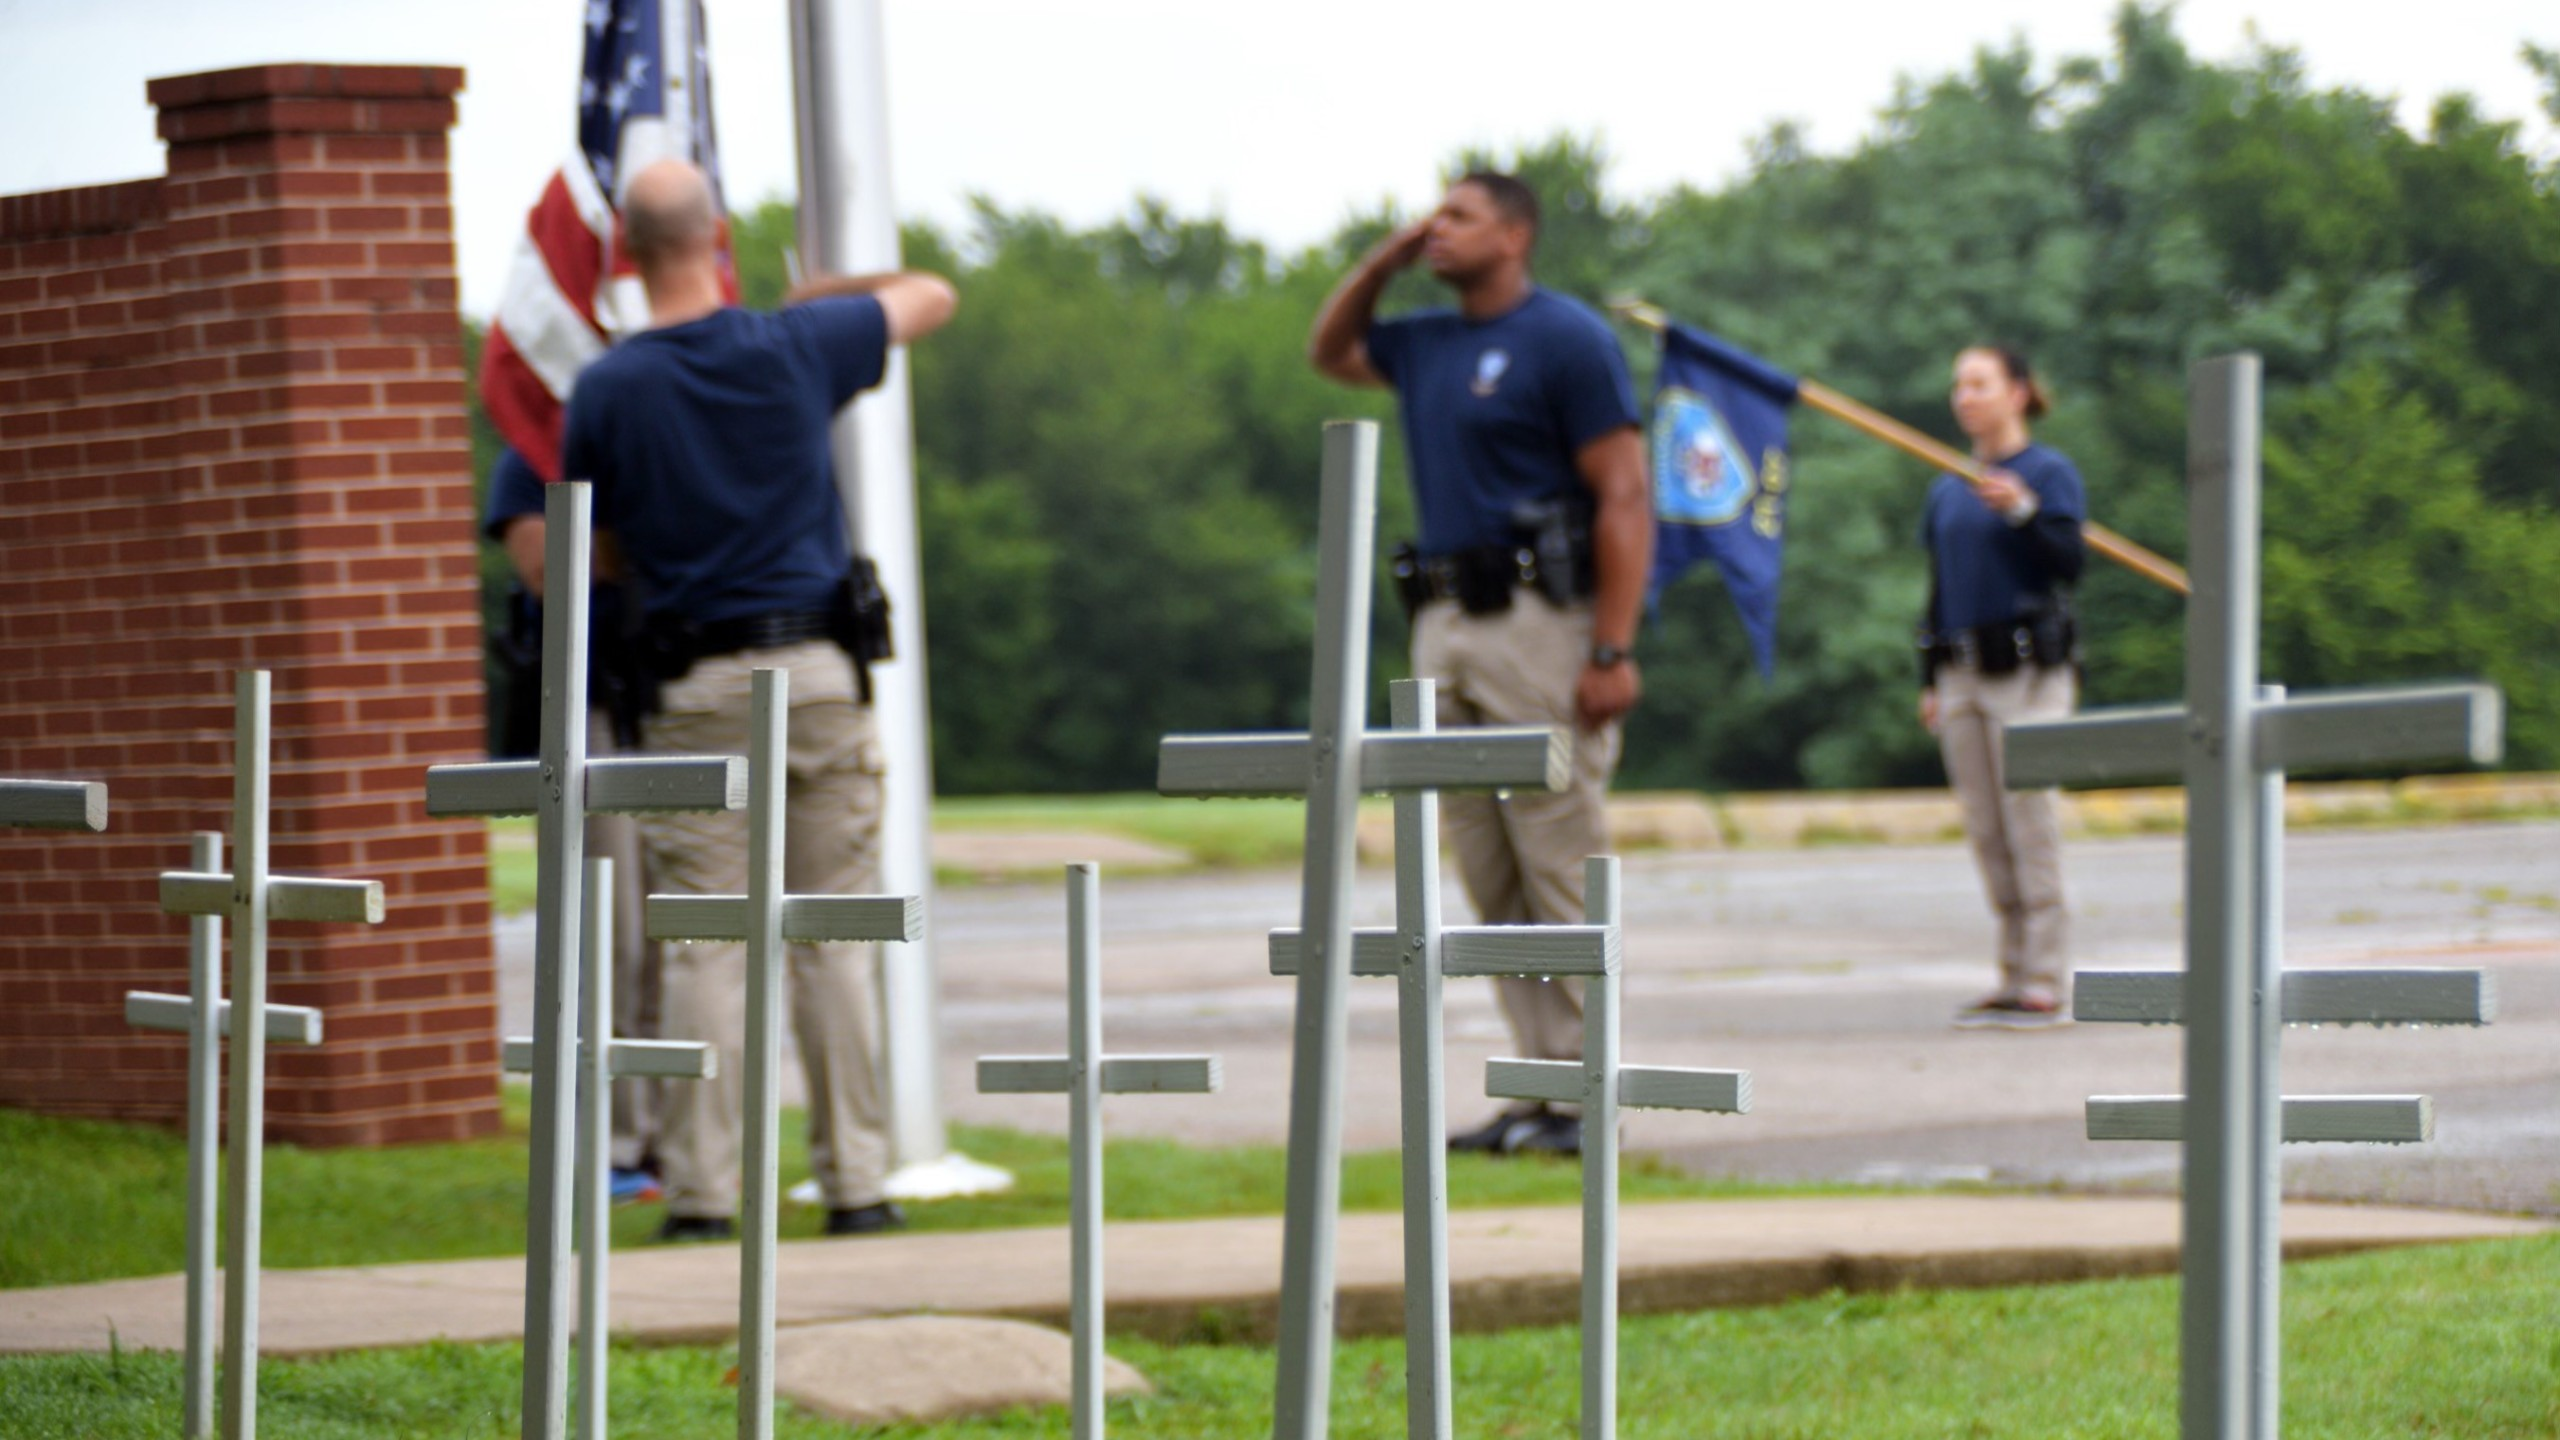 image of crosses outside edmond police academy